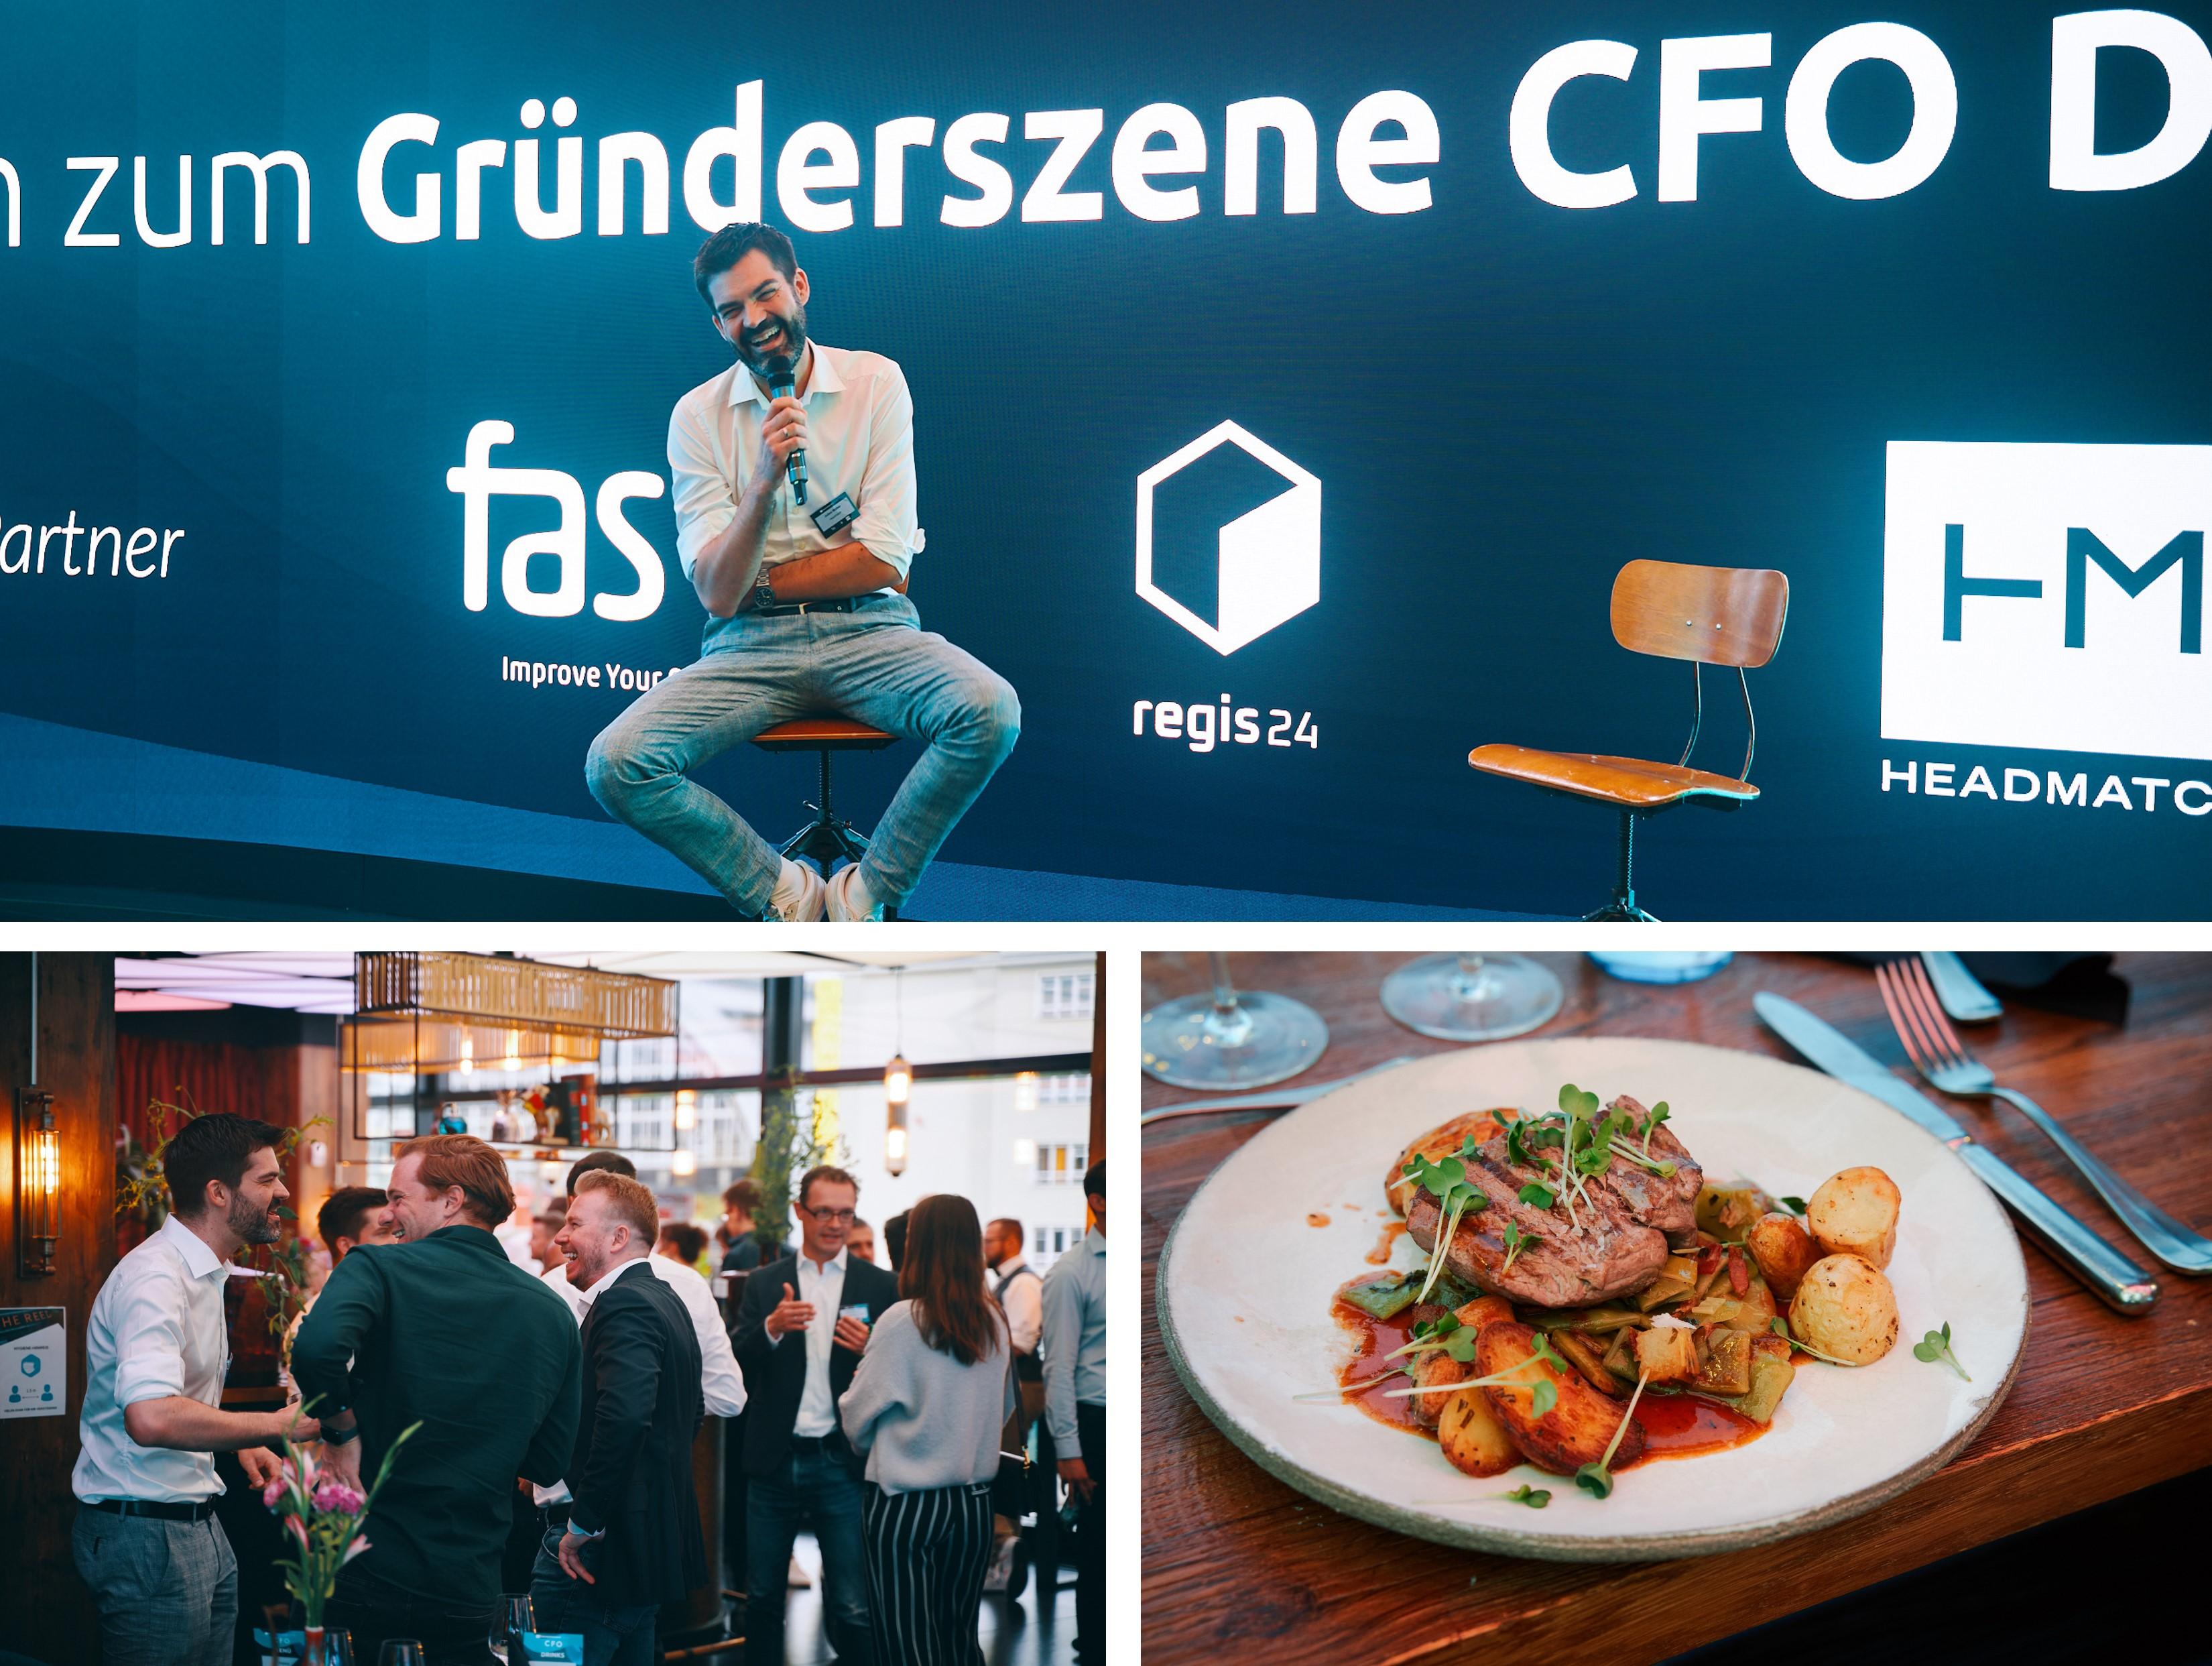 Headmatch beim Gründerszene CFO Dinner